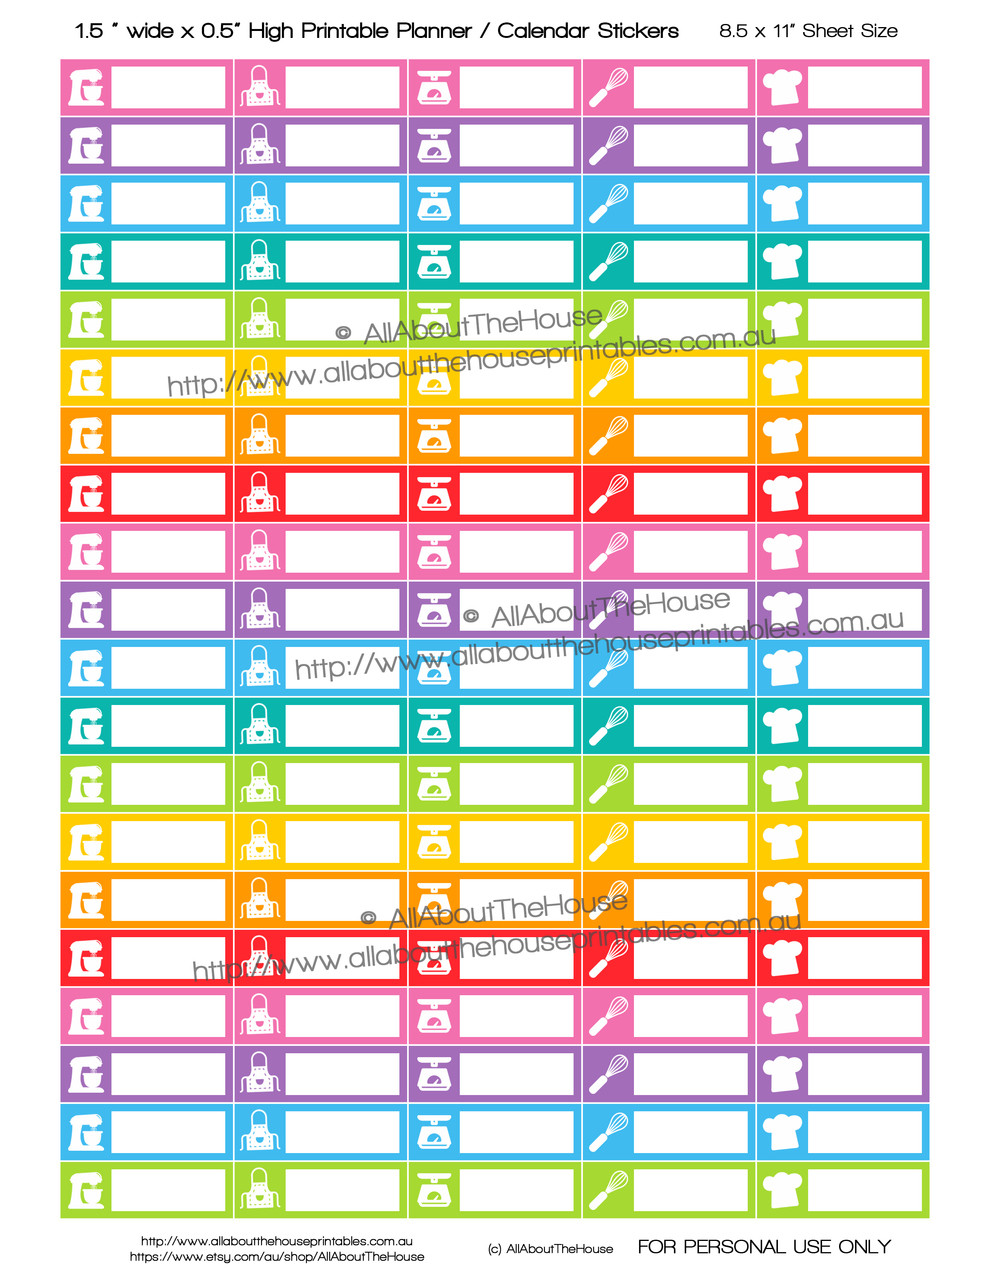 photo regarding Printable Planner Calendar named Baking - Printable Calendar / Planner Stickers - 1.5 x 0.5\